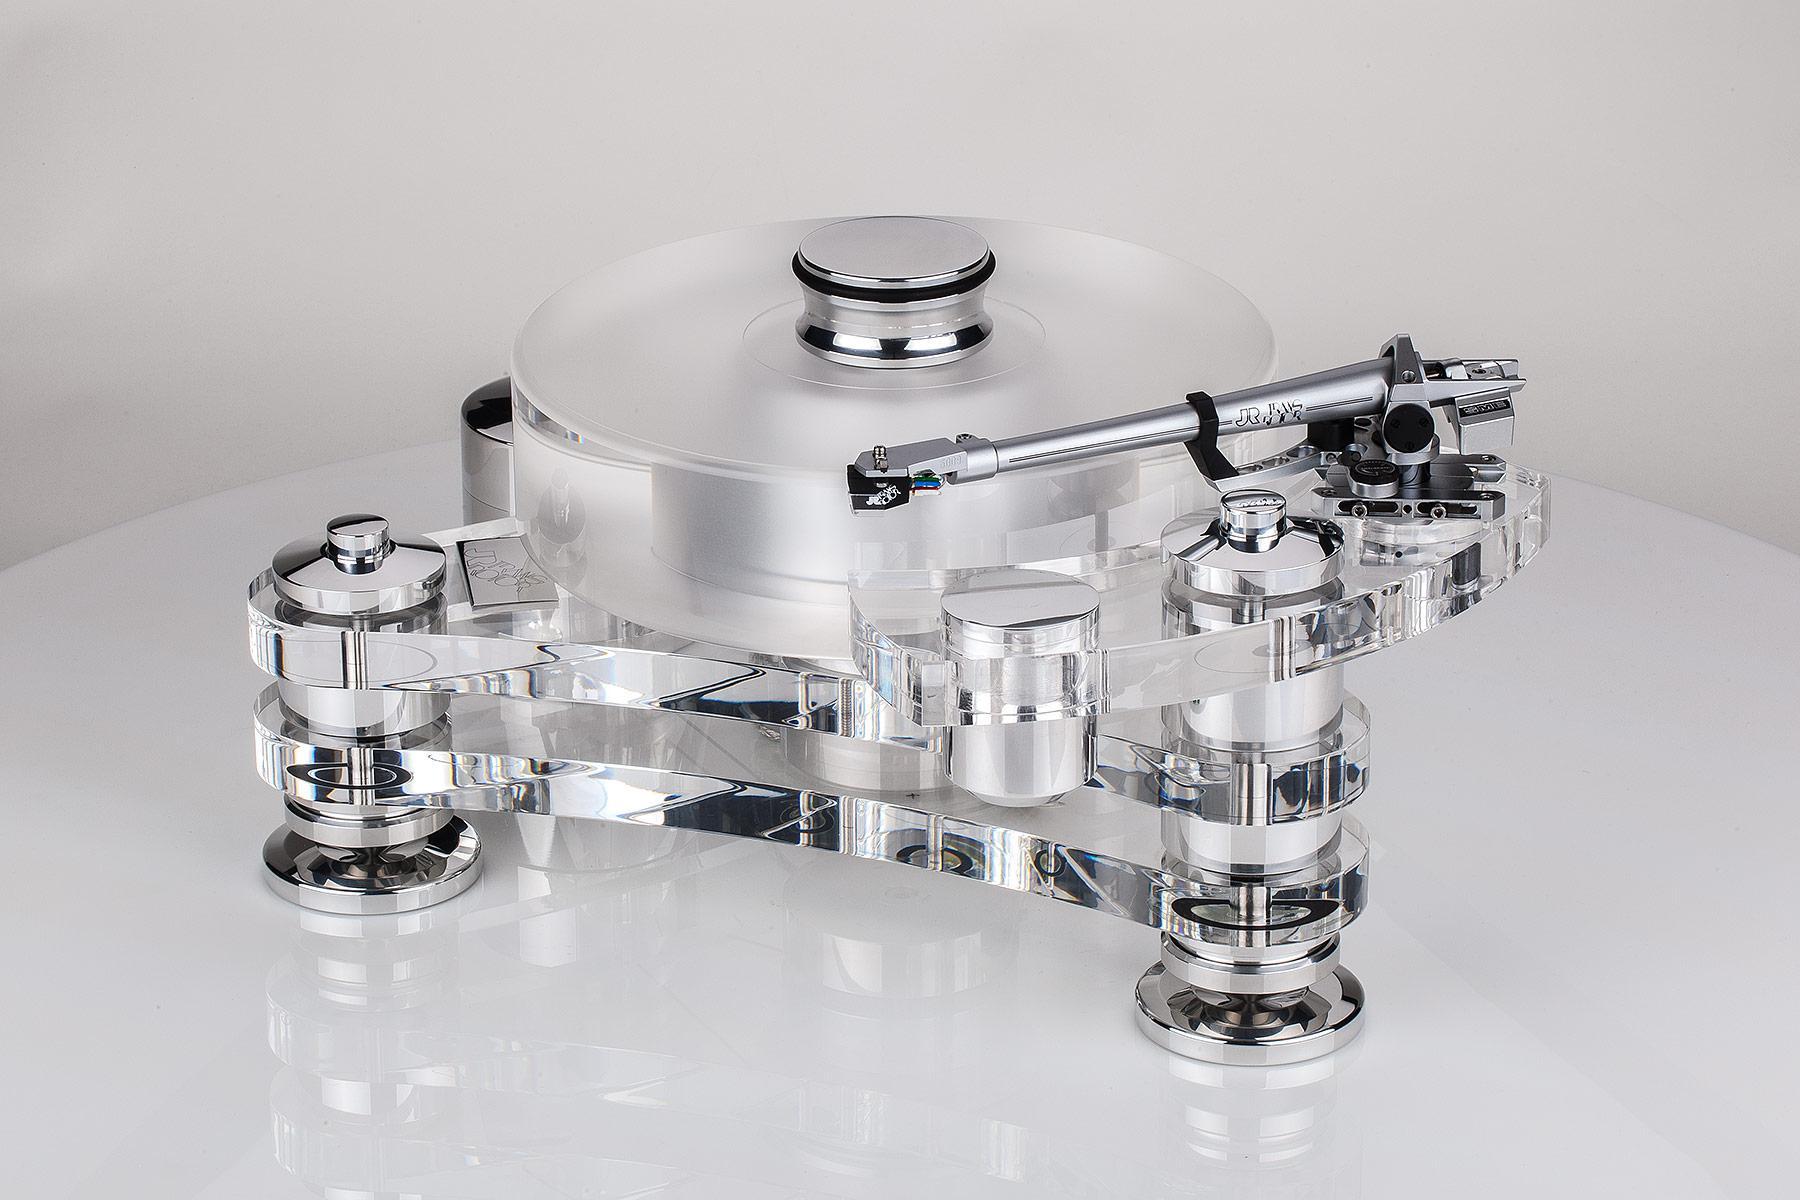 Transrotor/SME 5009 Barevné provedení: černé